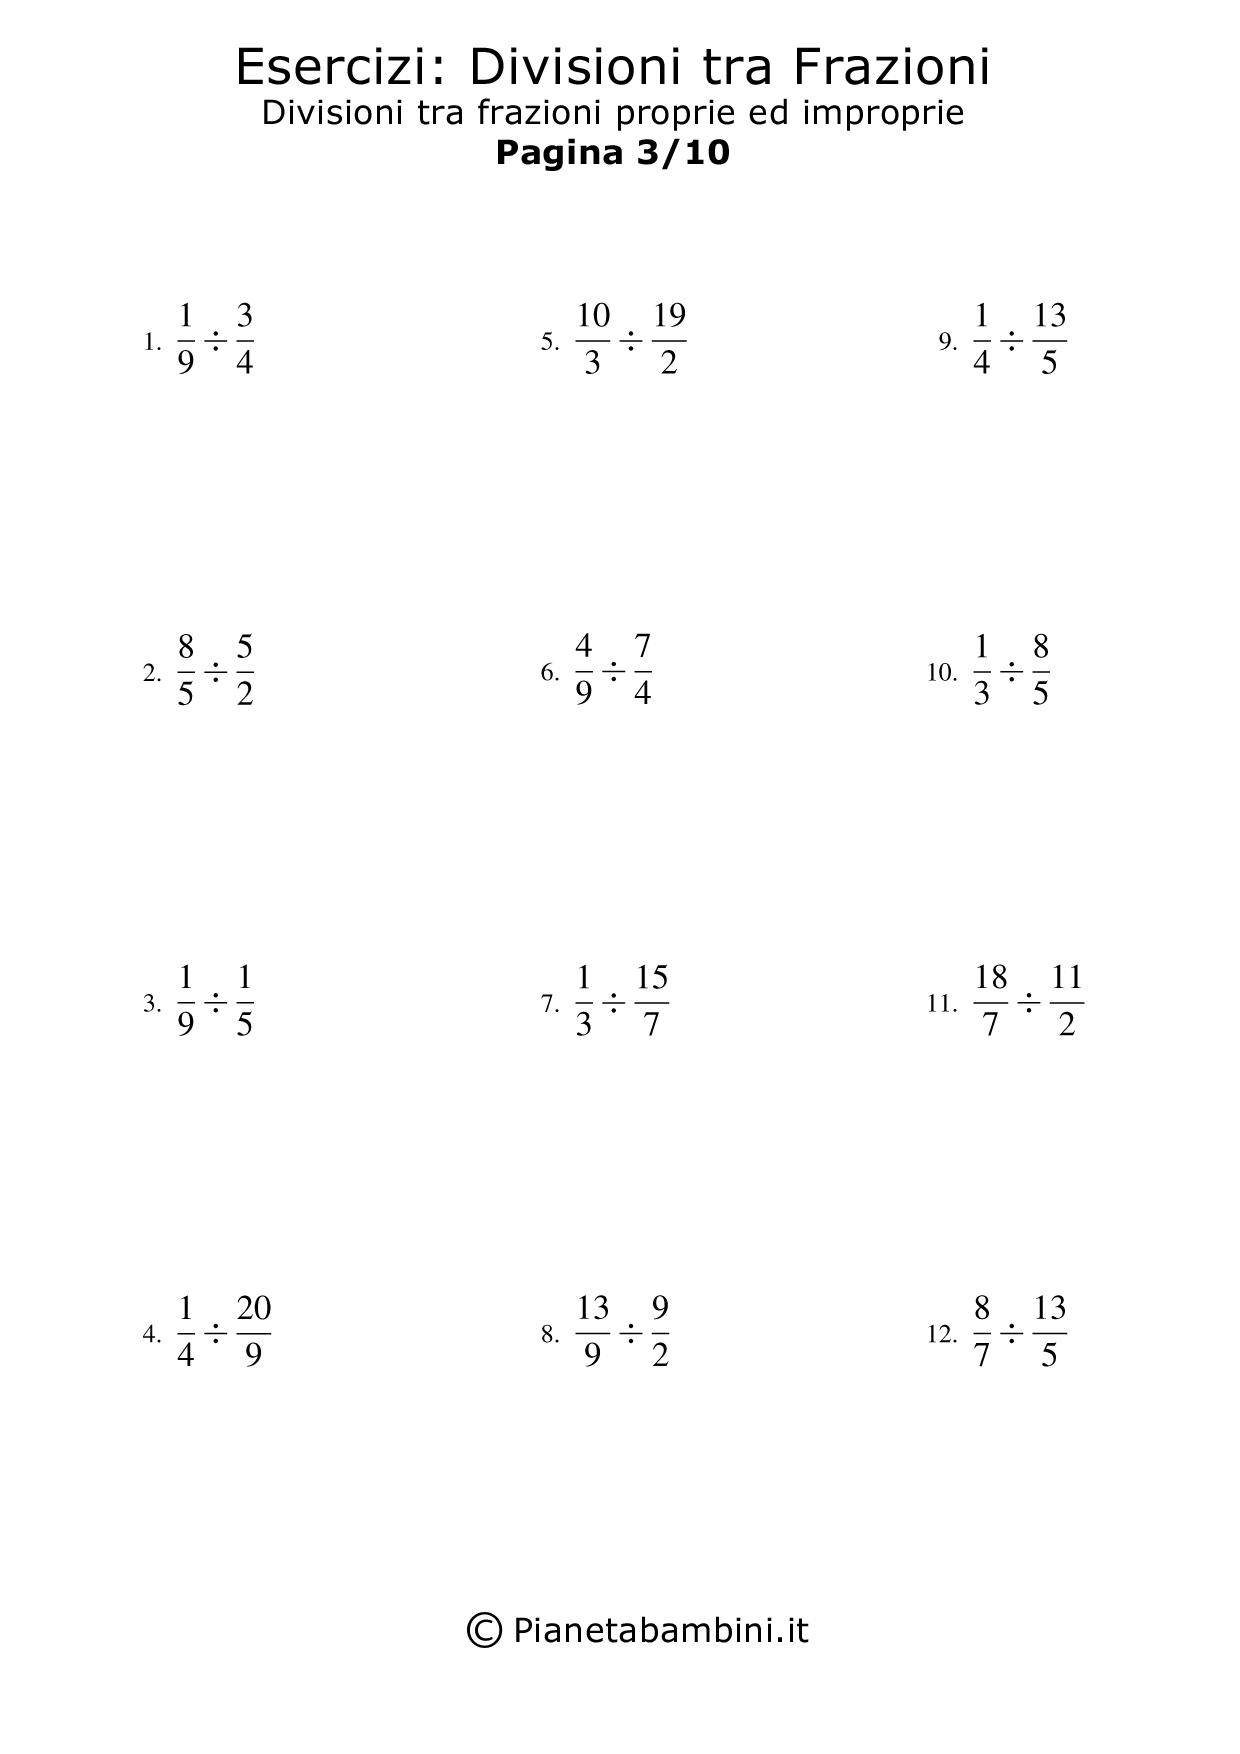 Esercizi-Divisioni-Frazioni-Proprie-Improprie_03